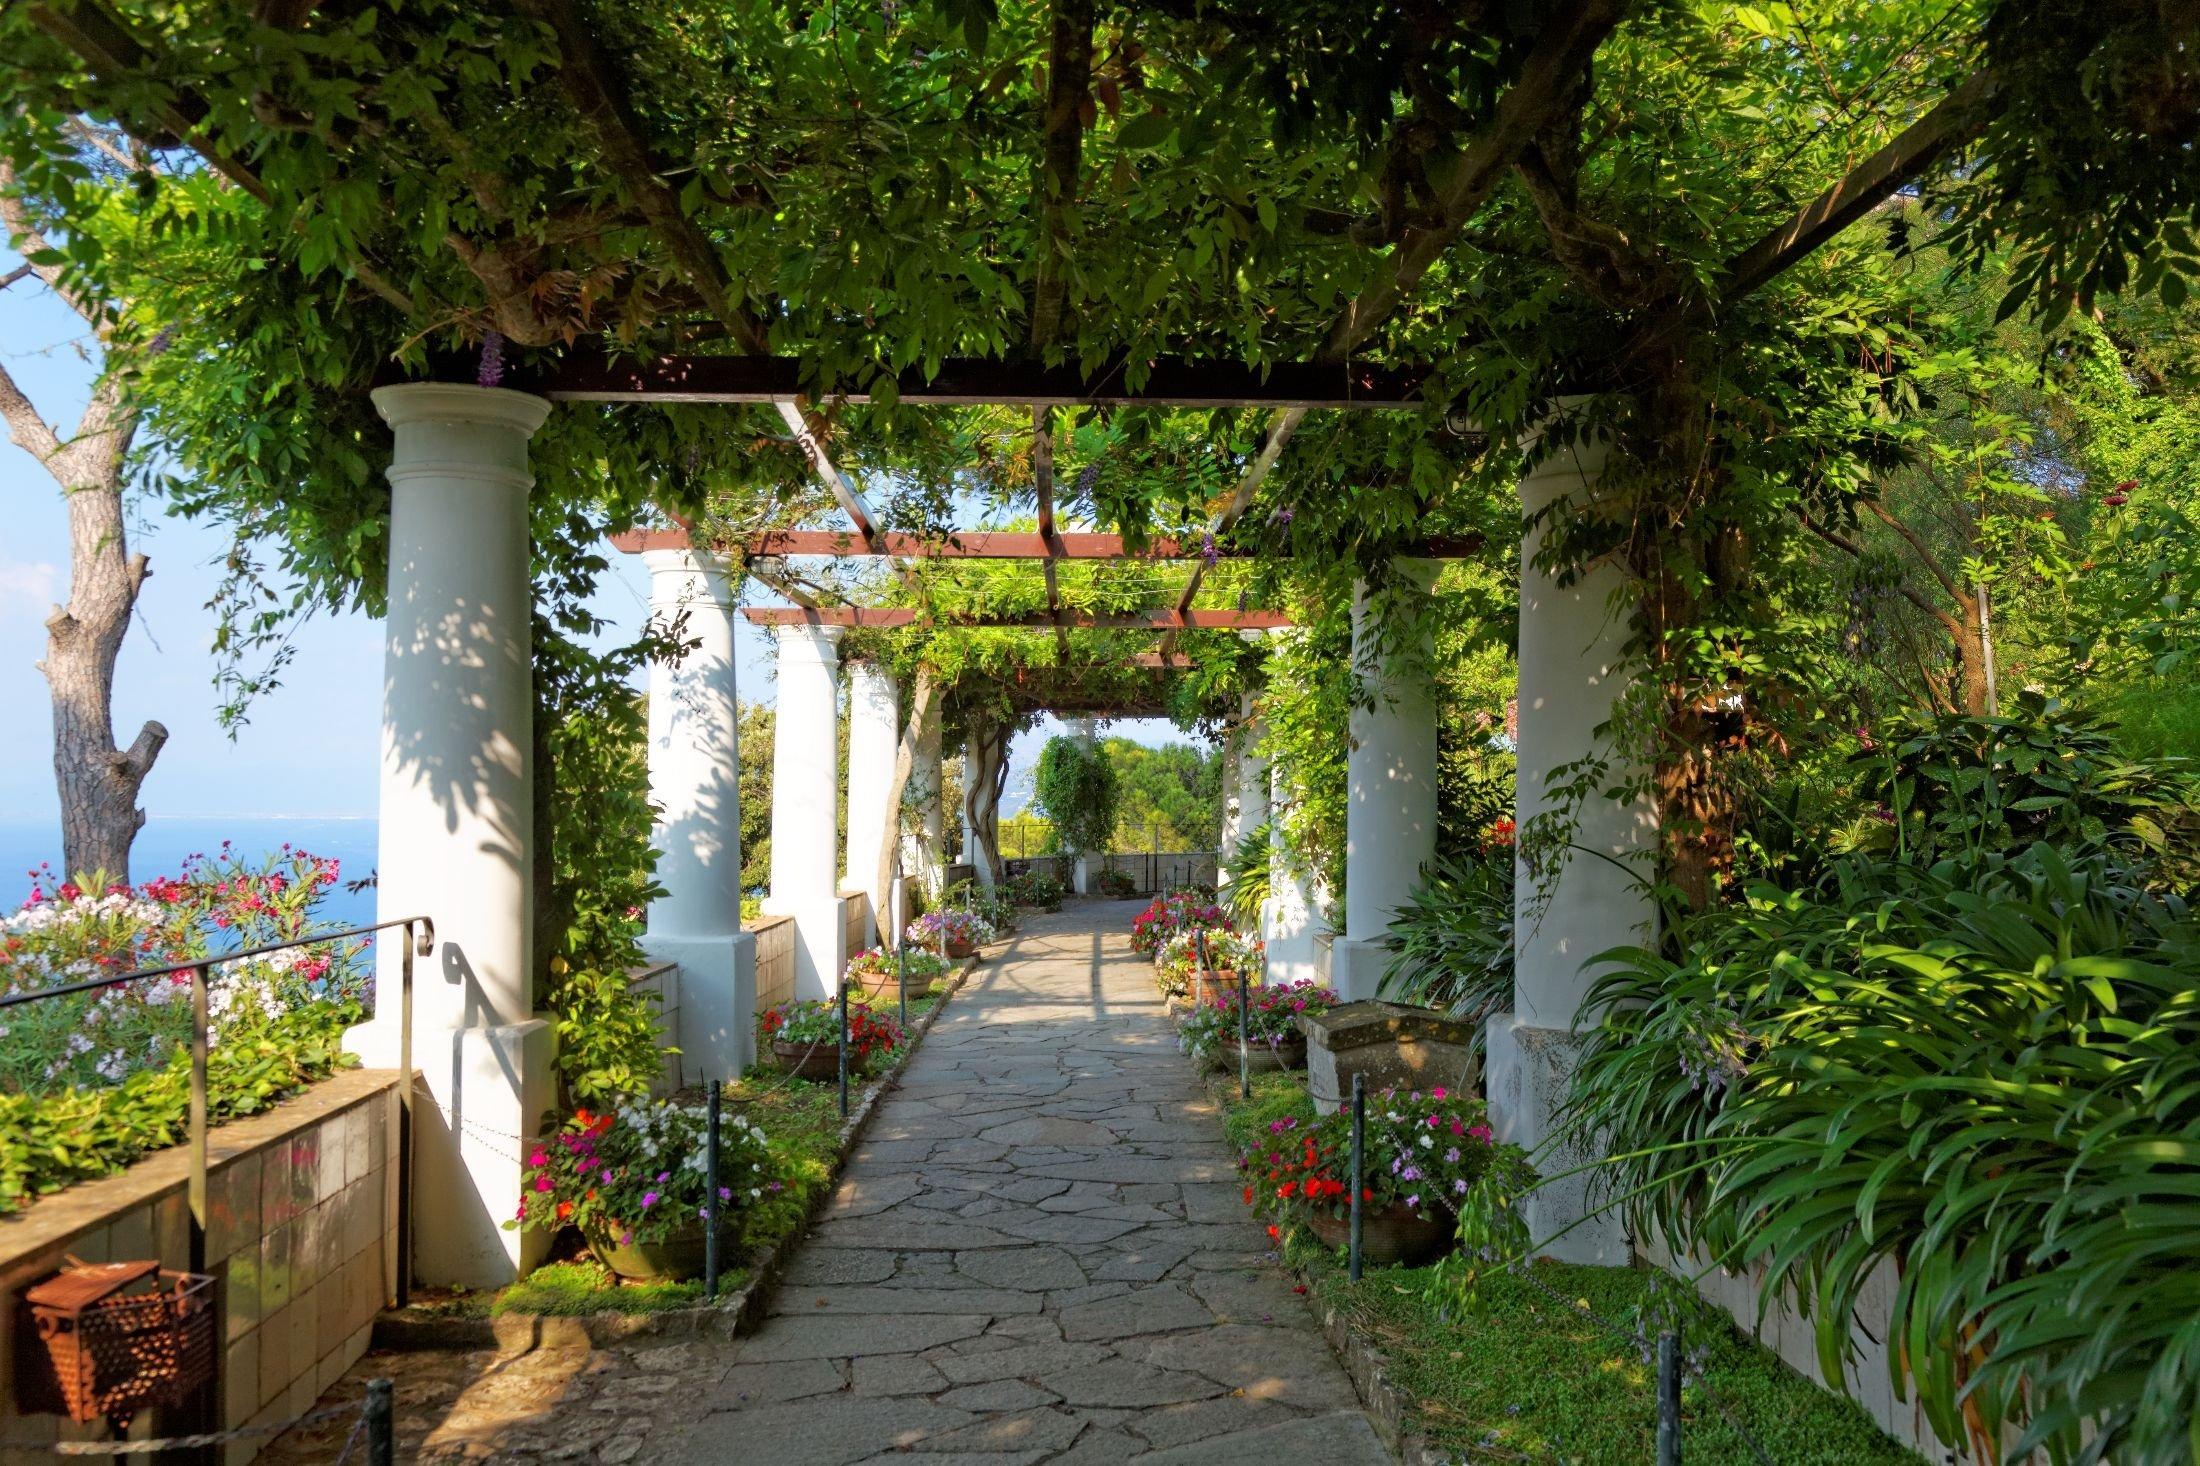 The sun shines through the public gardens of Villa San Michele on the island of Capri, Italy. (Shutterstock Photo)